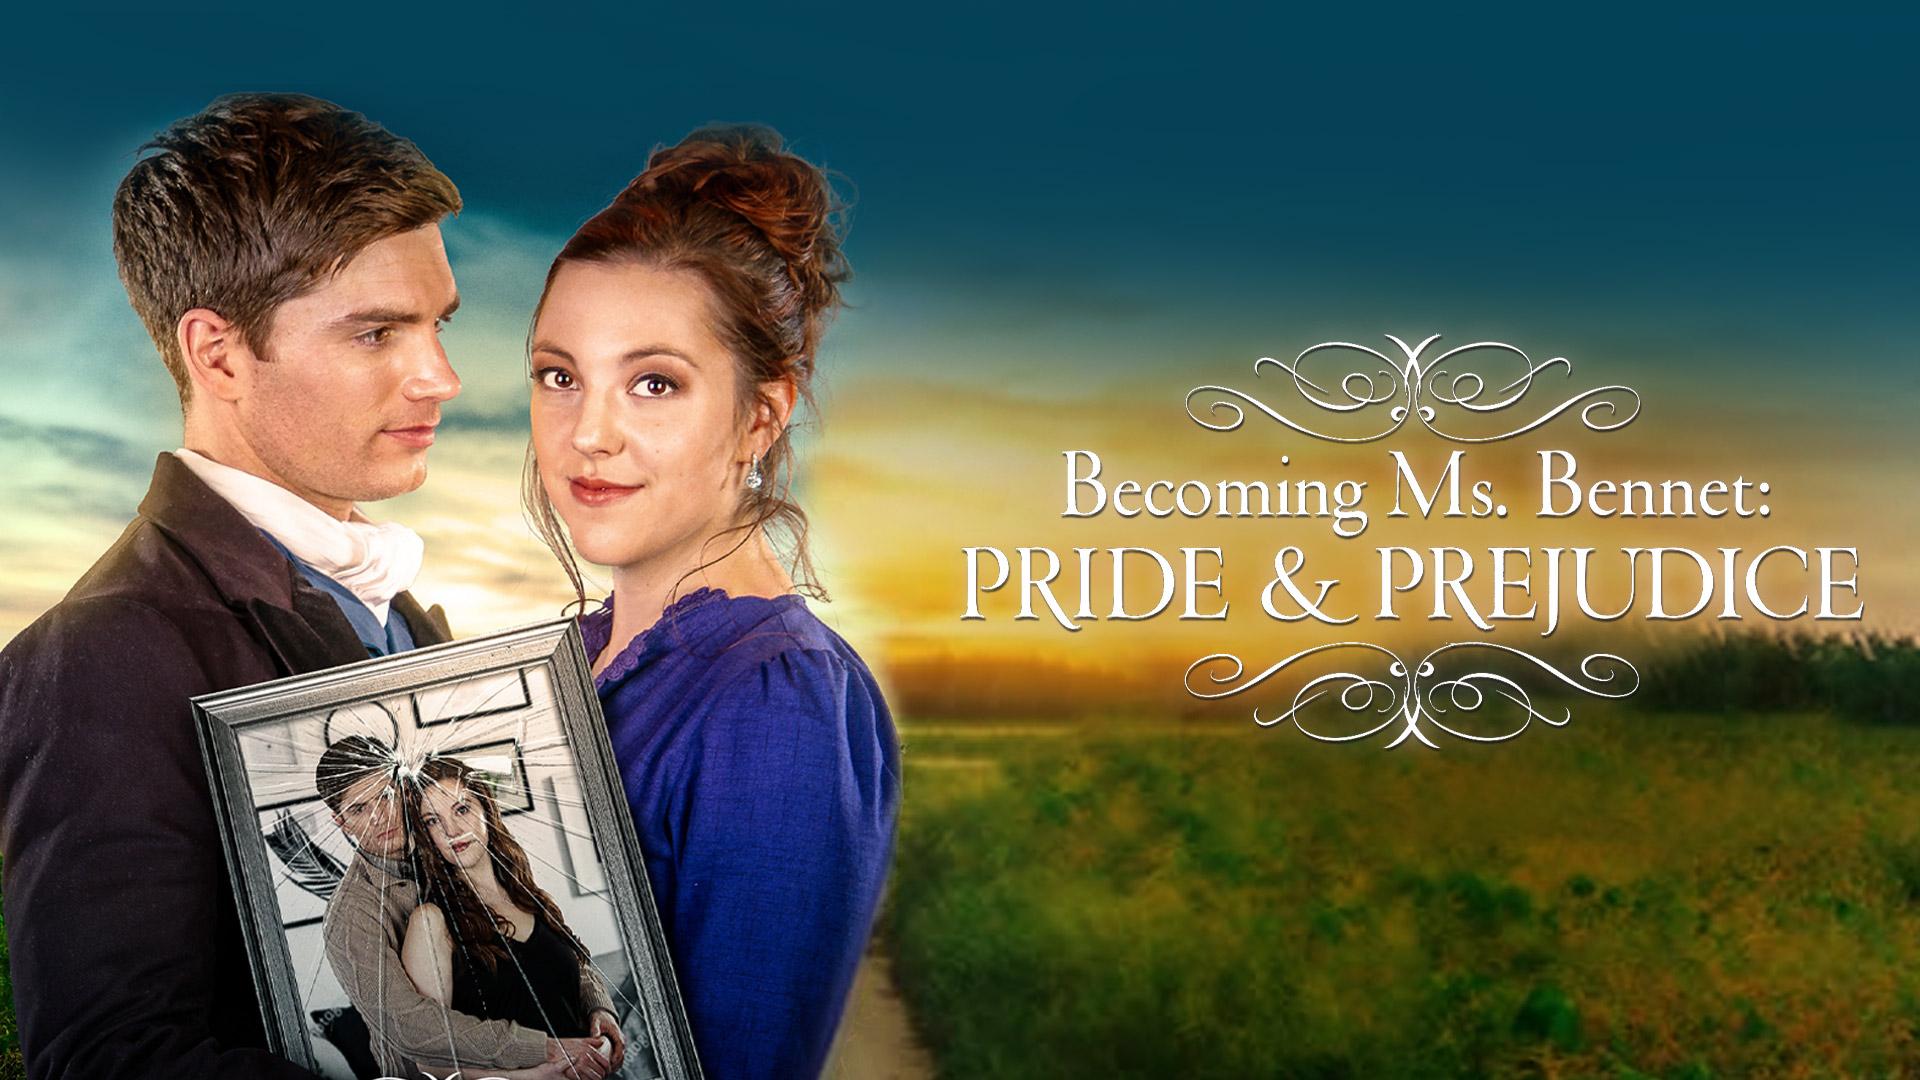 Becoming Ms. Bennet: Pride & Preju.